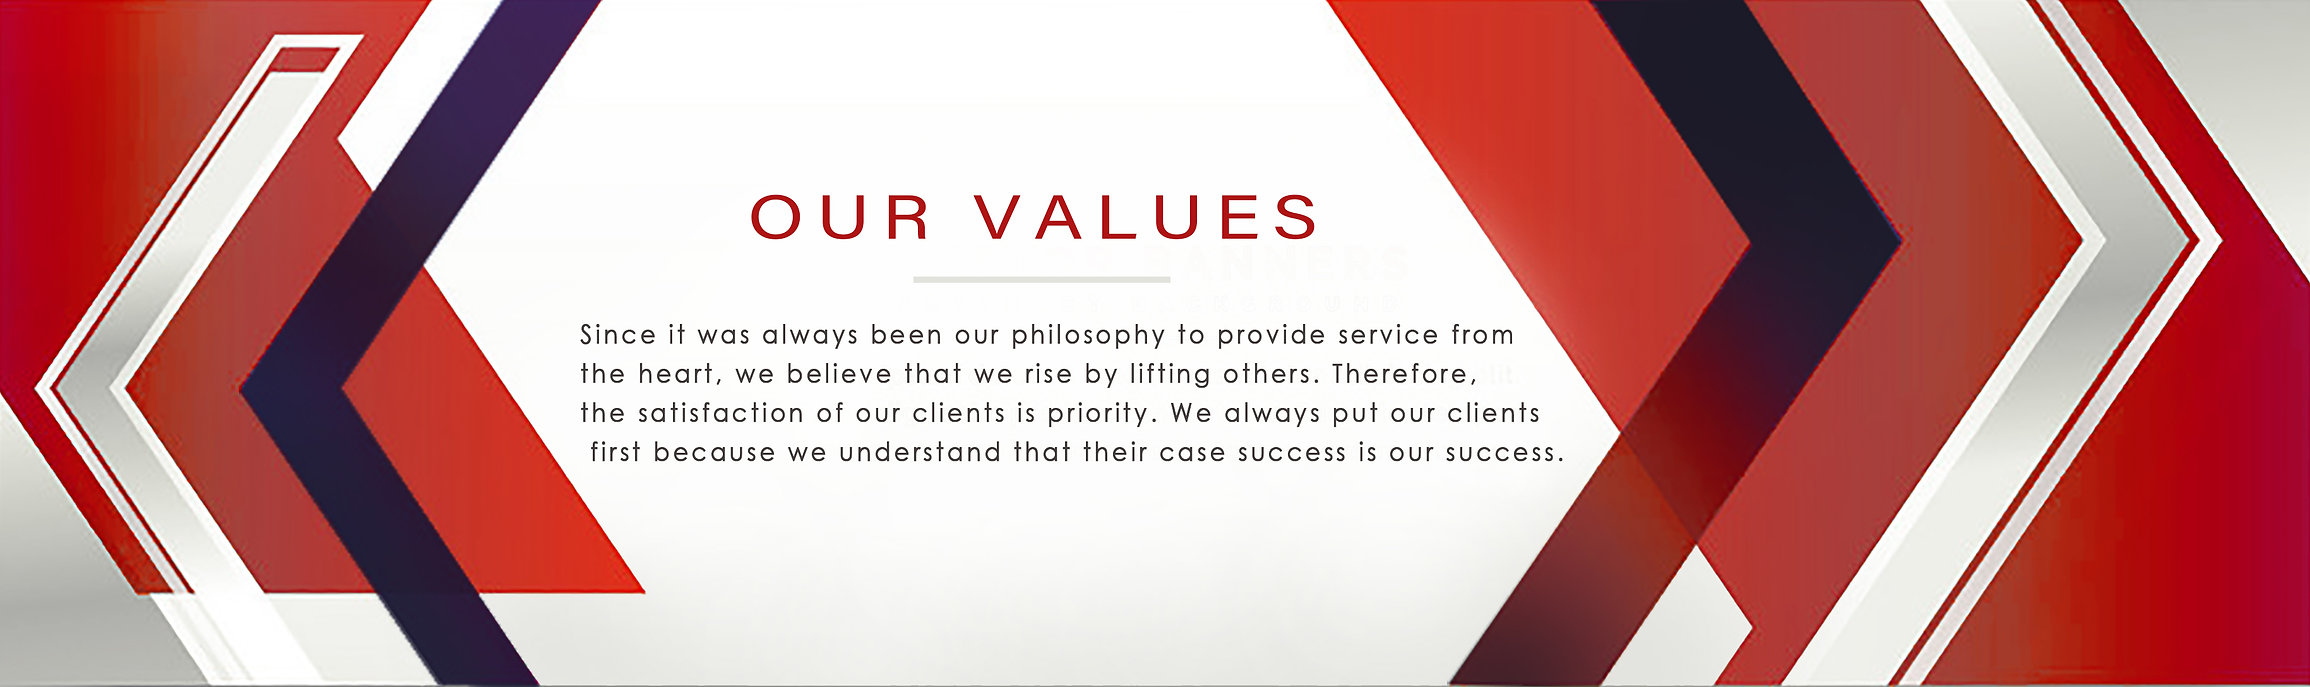 Values final.jpg